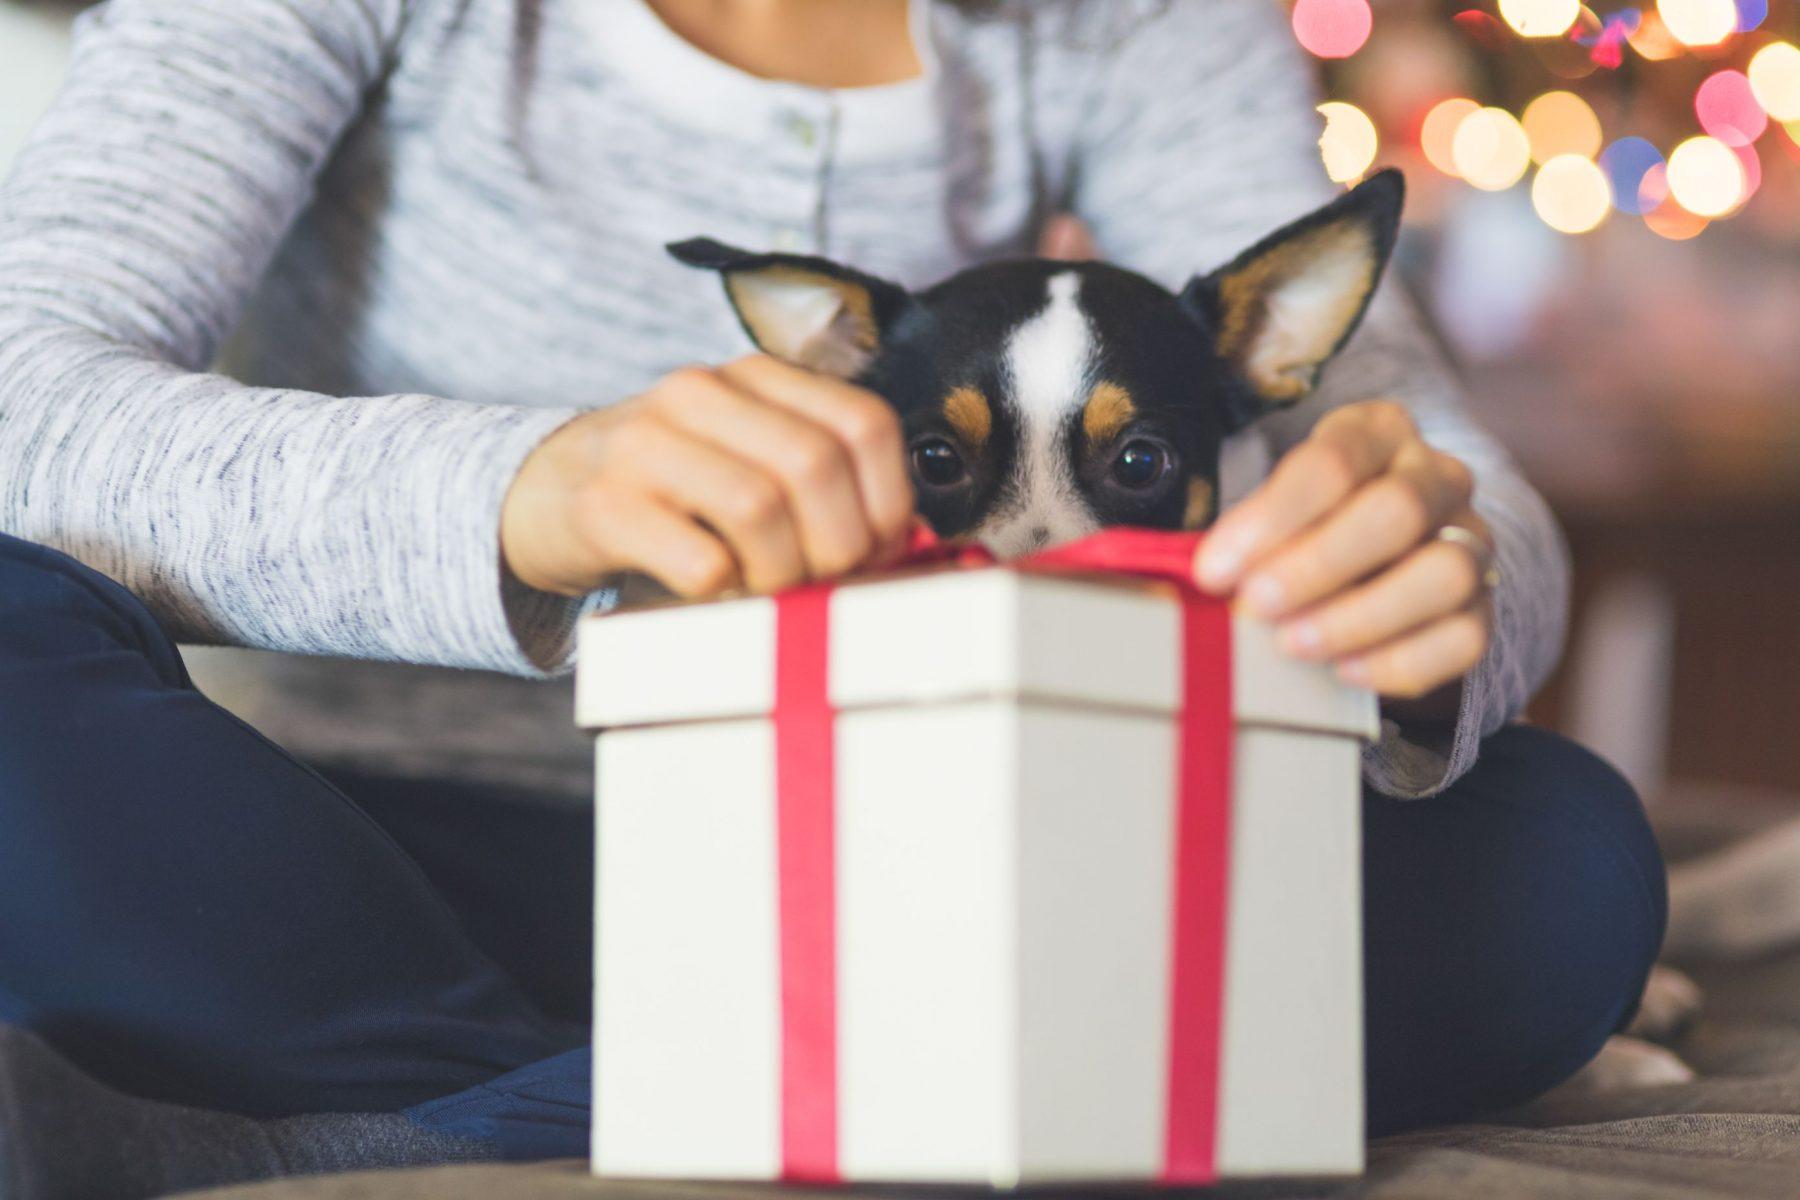 dog next to gift